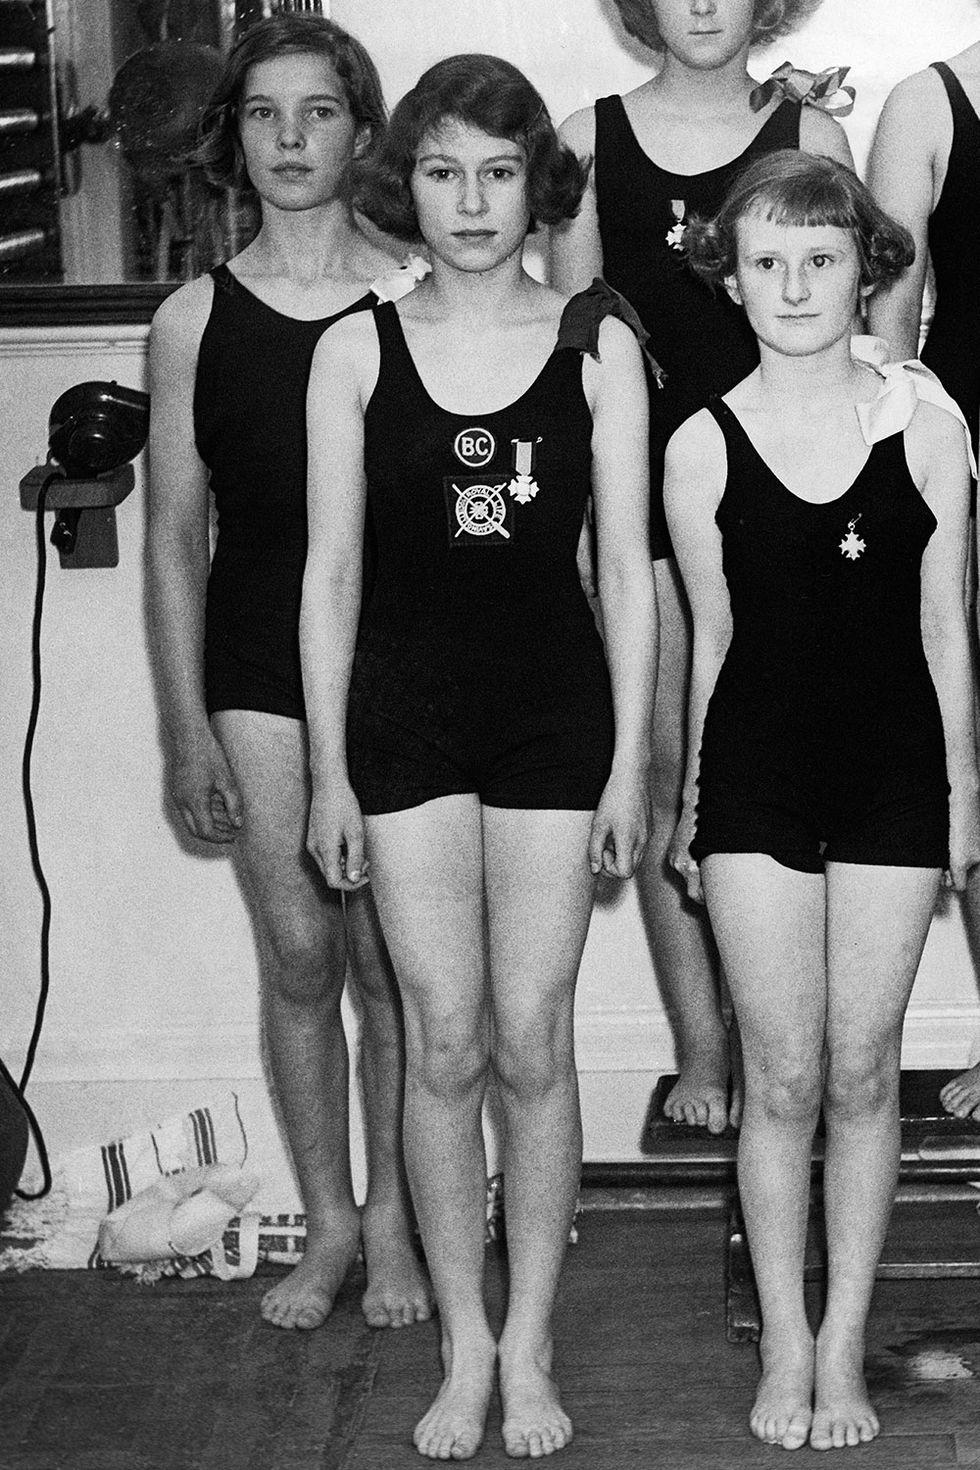 1939-elizabethii-swimming-1527018300.jpg